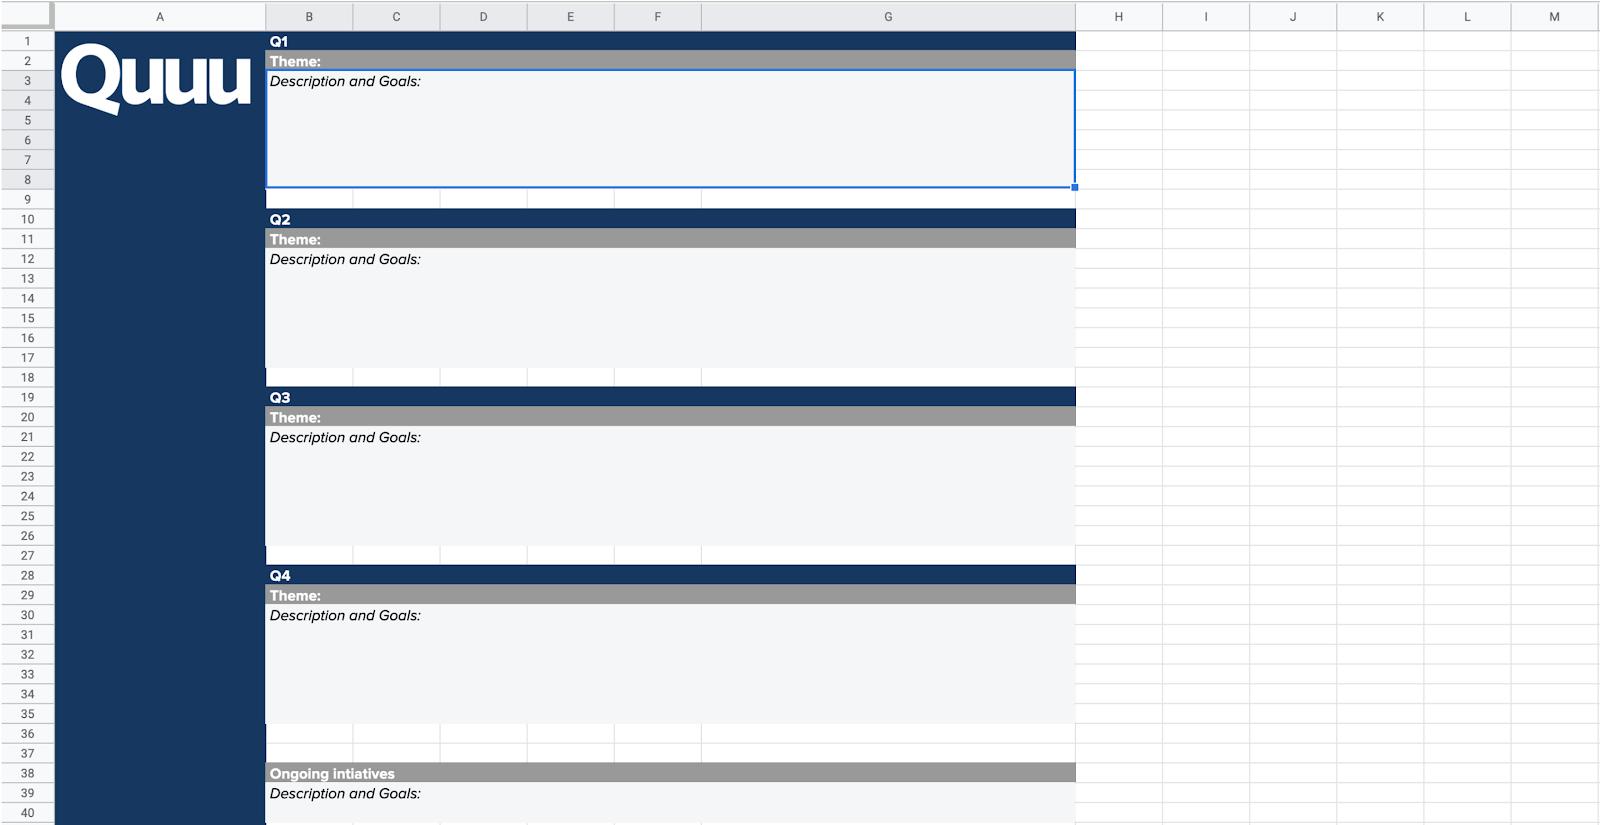 Example image of Quuu's free content calendar